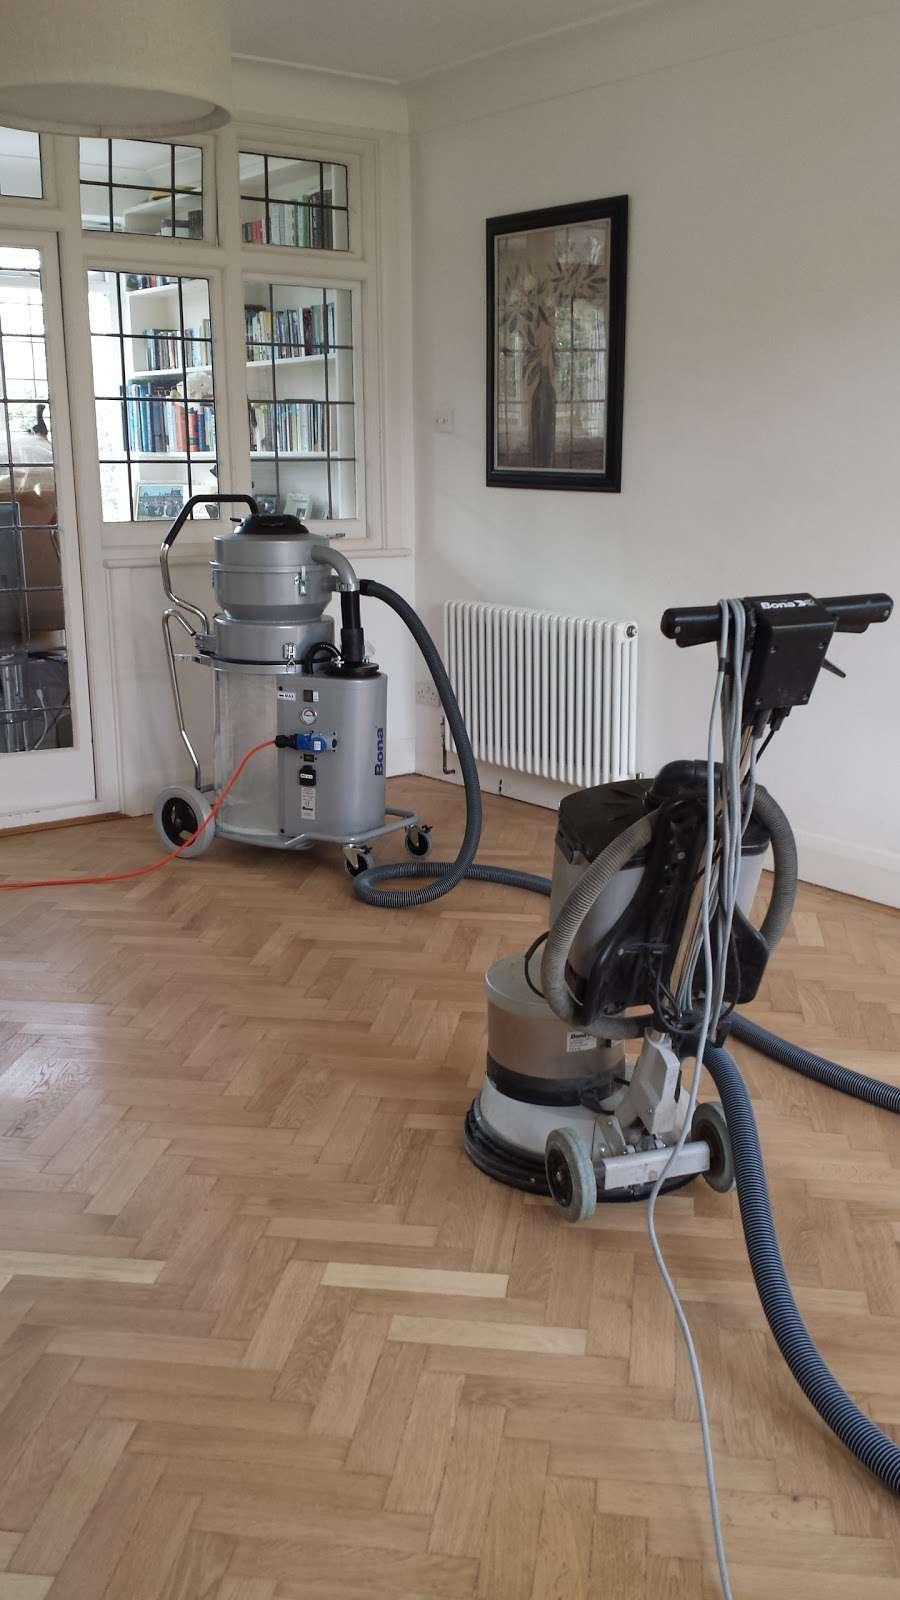 Surrey Flooring Services - store  | Photo 2 of 10 | Address: 65 Cotterill Rd, Surbiton KT6 7UJ, UK | Phone: 020 8875 1260